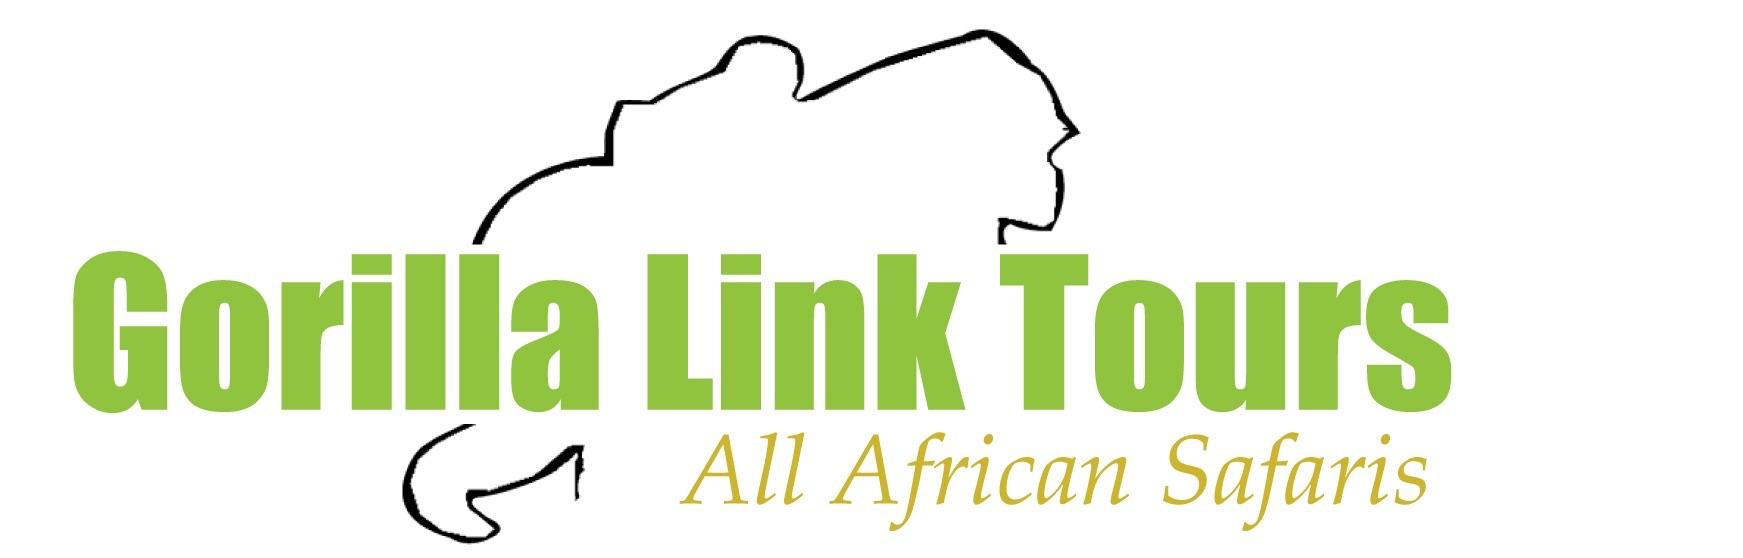 Gorilla Link Tours Africa, Uganda